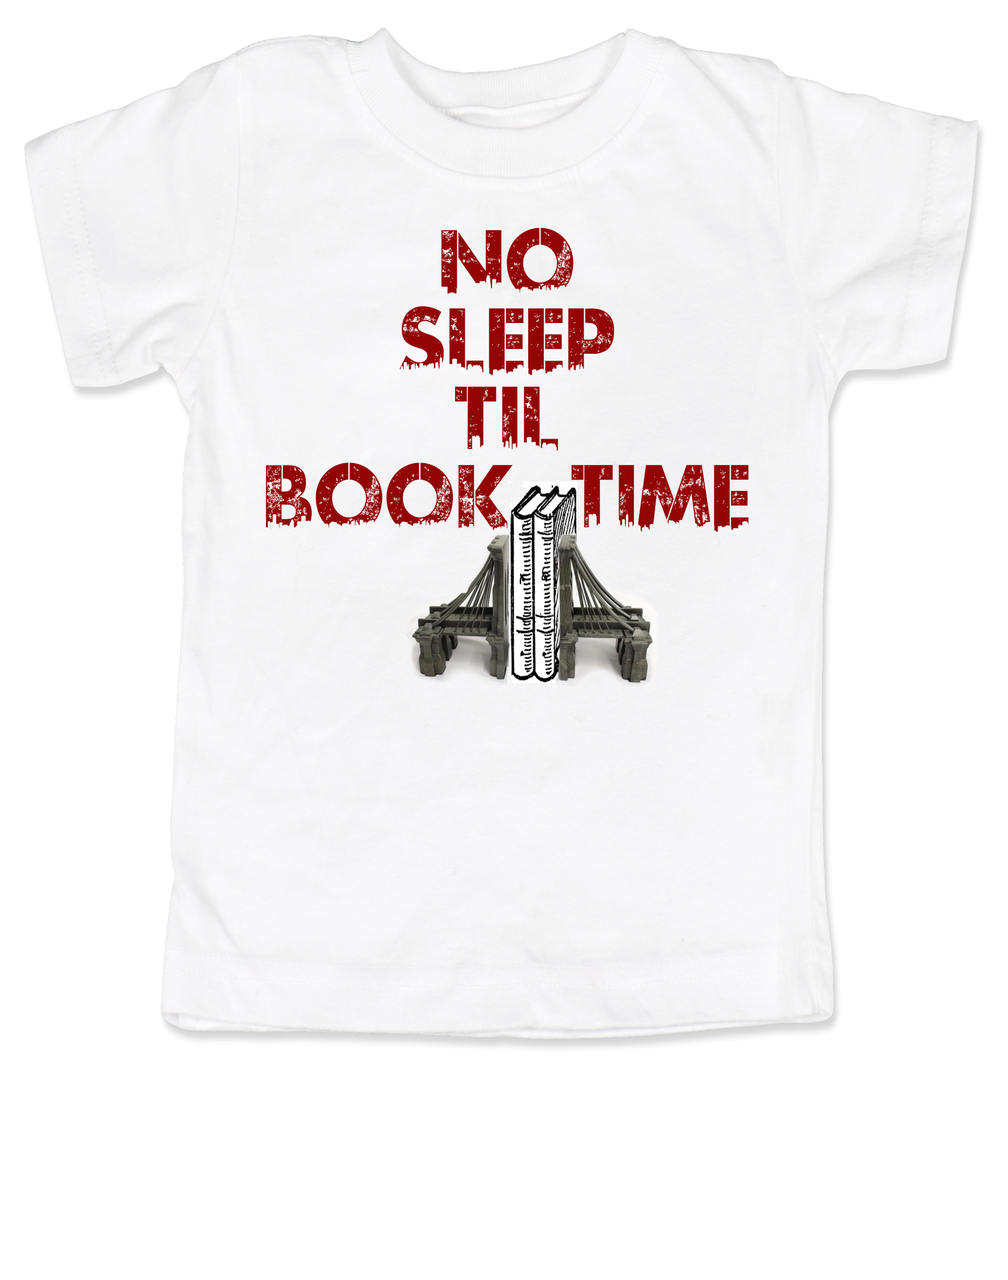 df2f5f4cf No Sleep Til Book Time Toddler Shirt